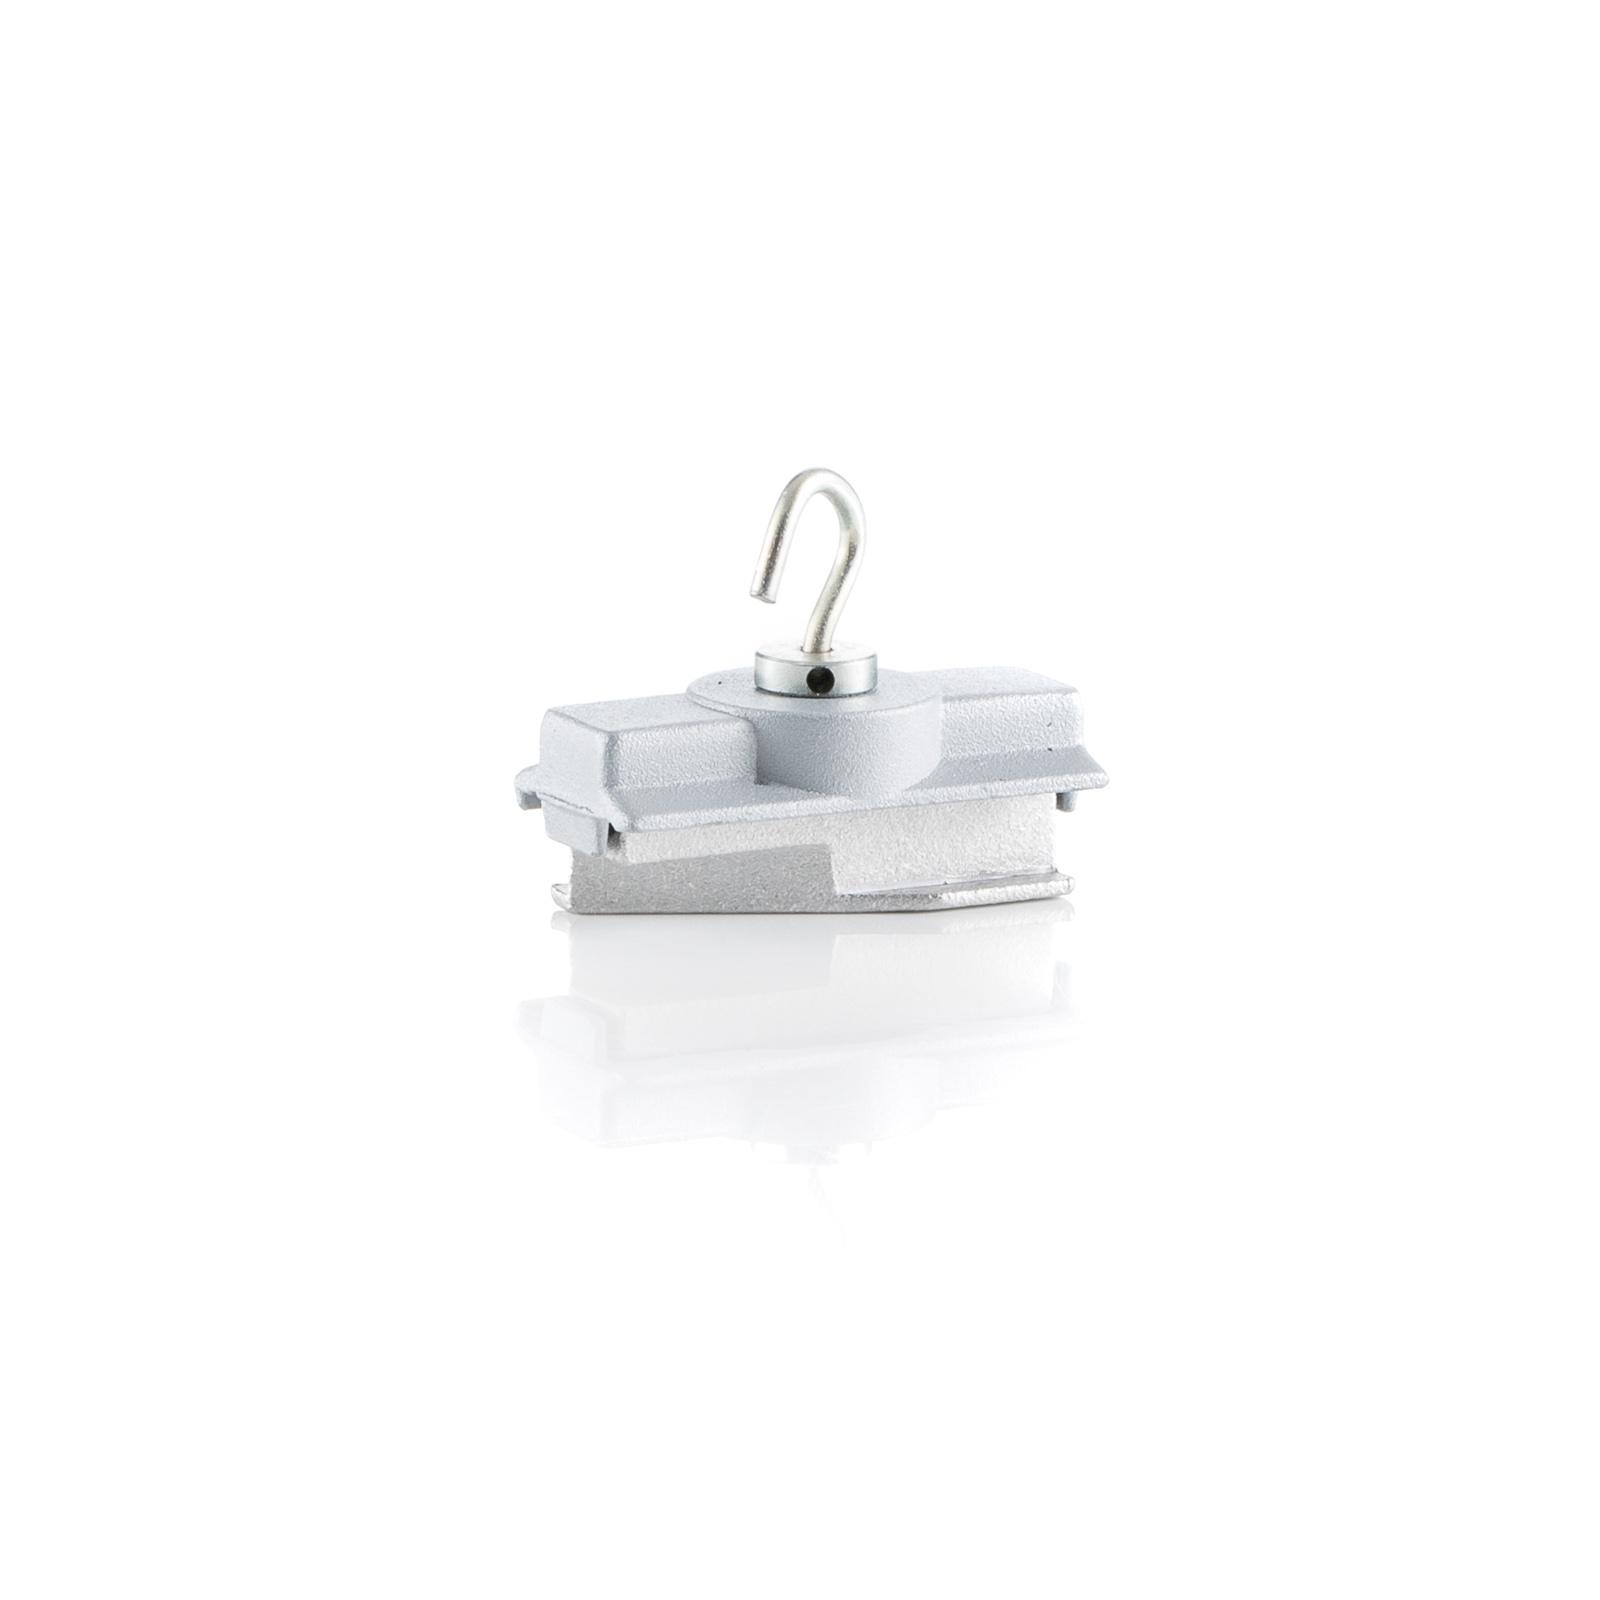 Ivela Adapter mechanisch, mit Haken, silber